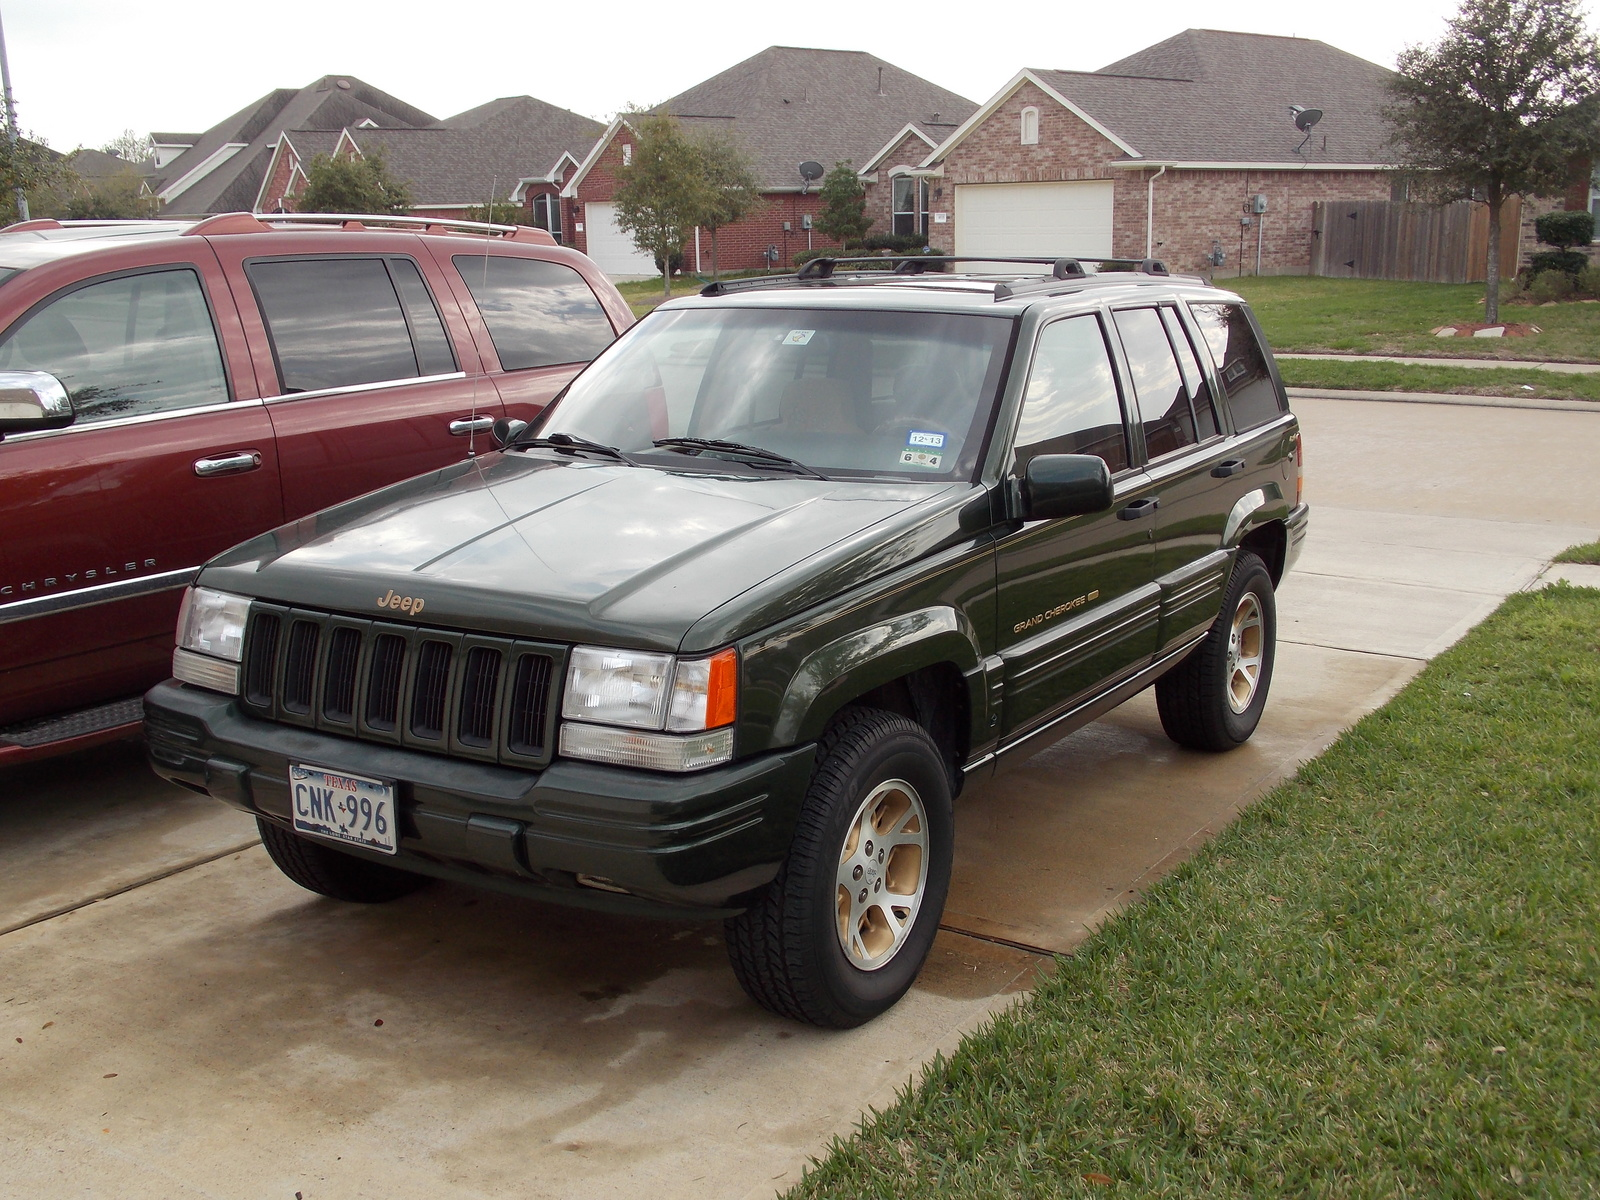 Used 2014 Jeep Grand Cherokee >> 1996 Jeep Grand Cherokee - Pictures - CarGurus